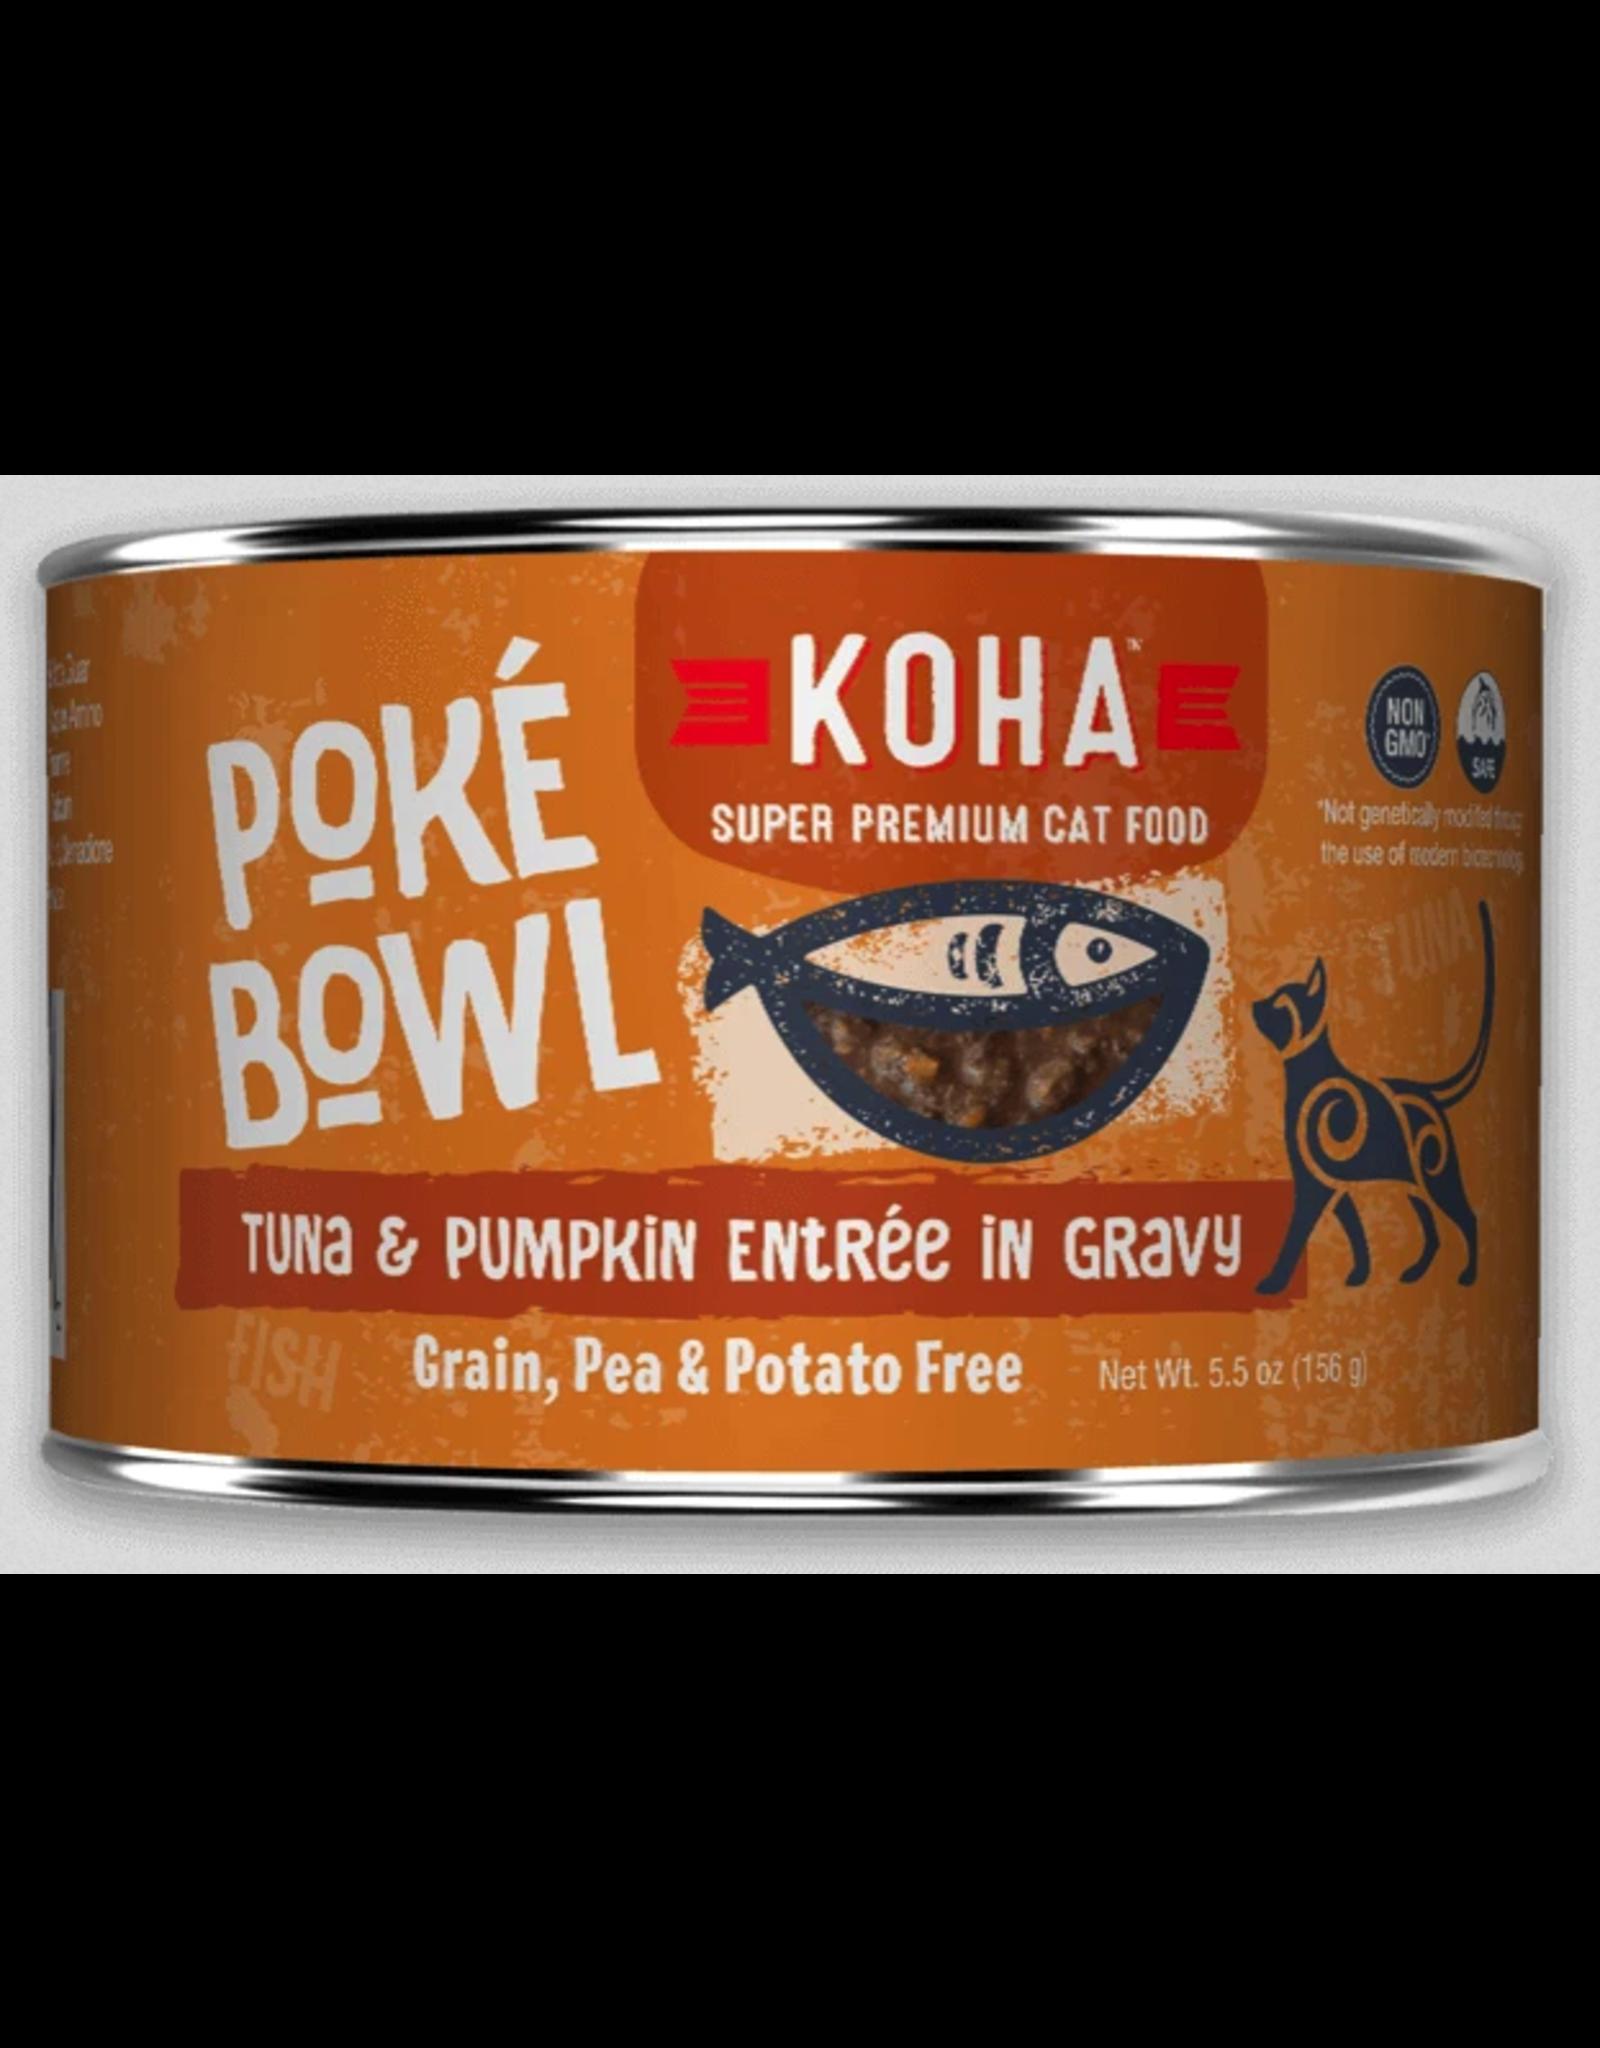 Koha Pet Koha Cat Poke Bowl Tuna Pumpkin Can 5.5oz